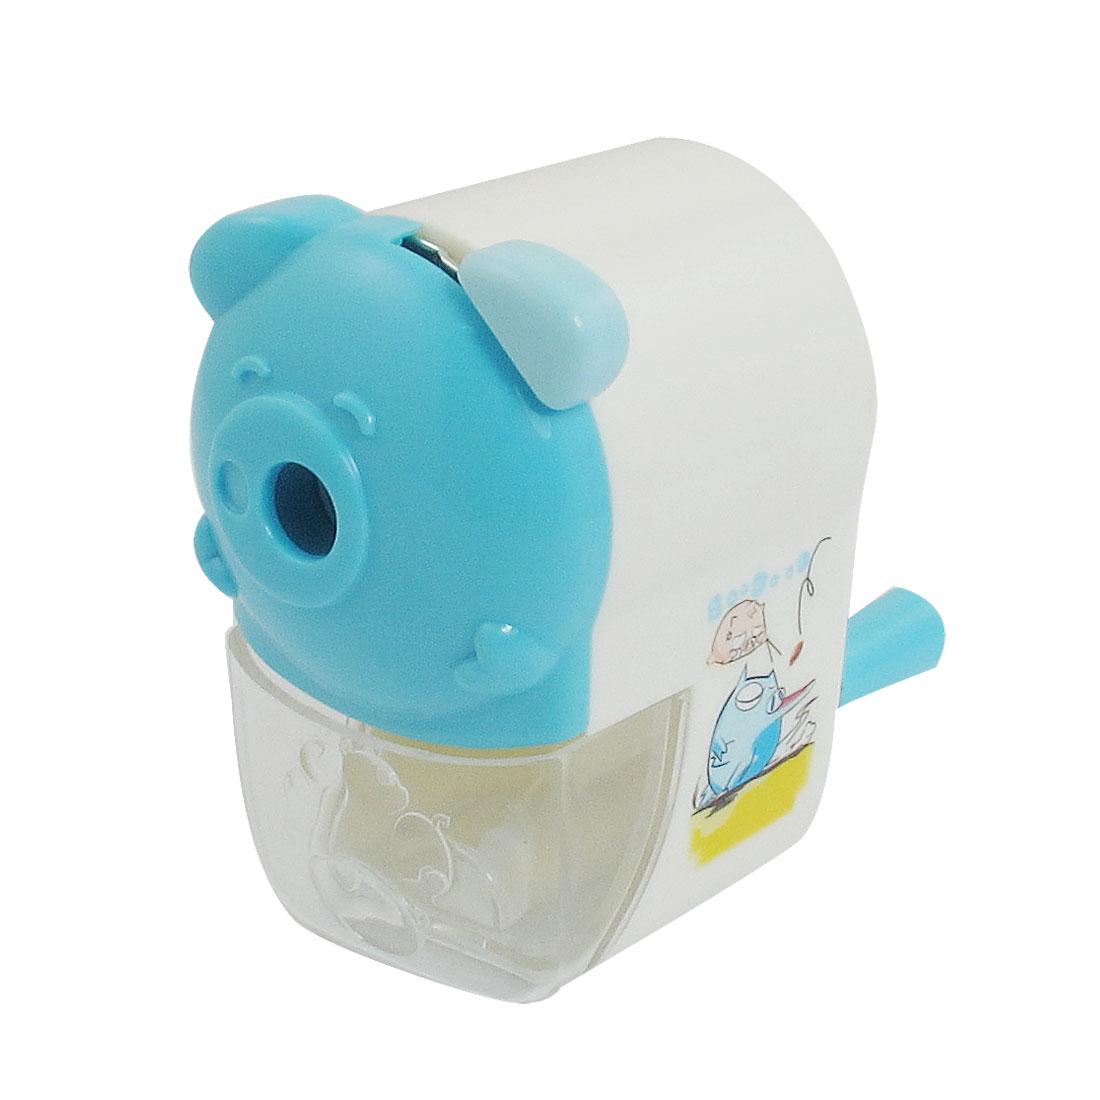 Cartoon Pig Pattern Blue White Plastic Shell Hand Rotating Pencil Sharpener